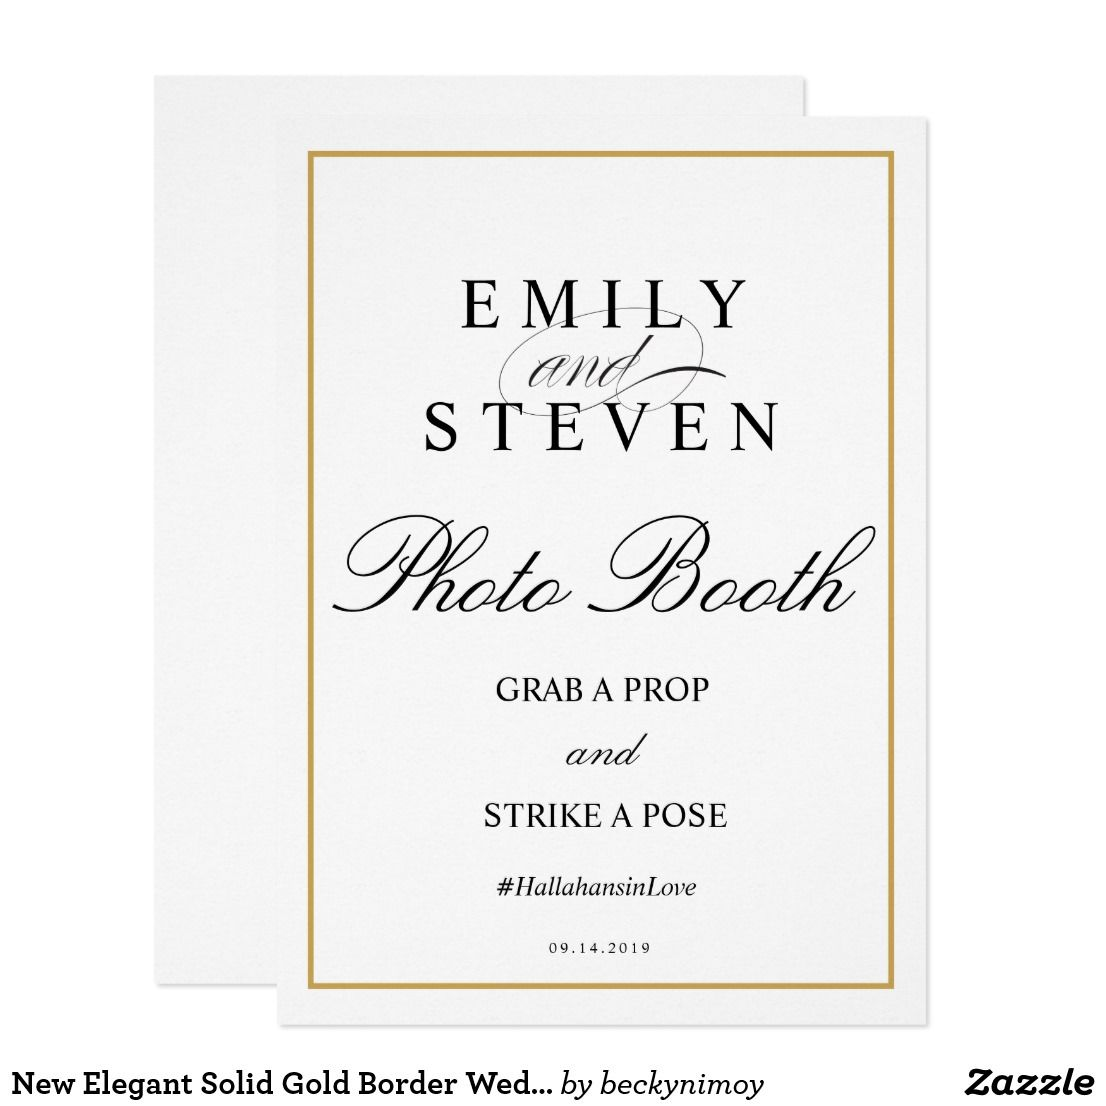 New Elegant Solid Gold Border Wedding Invitation | Wedding: Fall ...